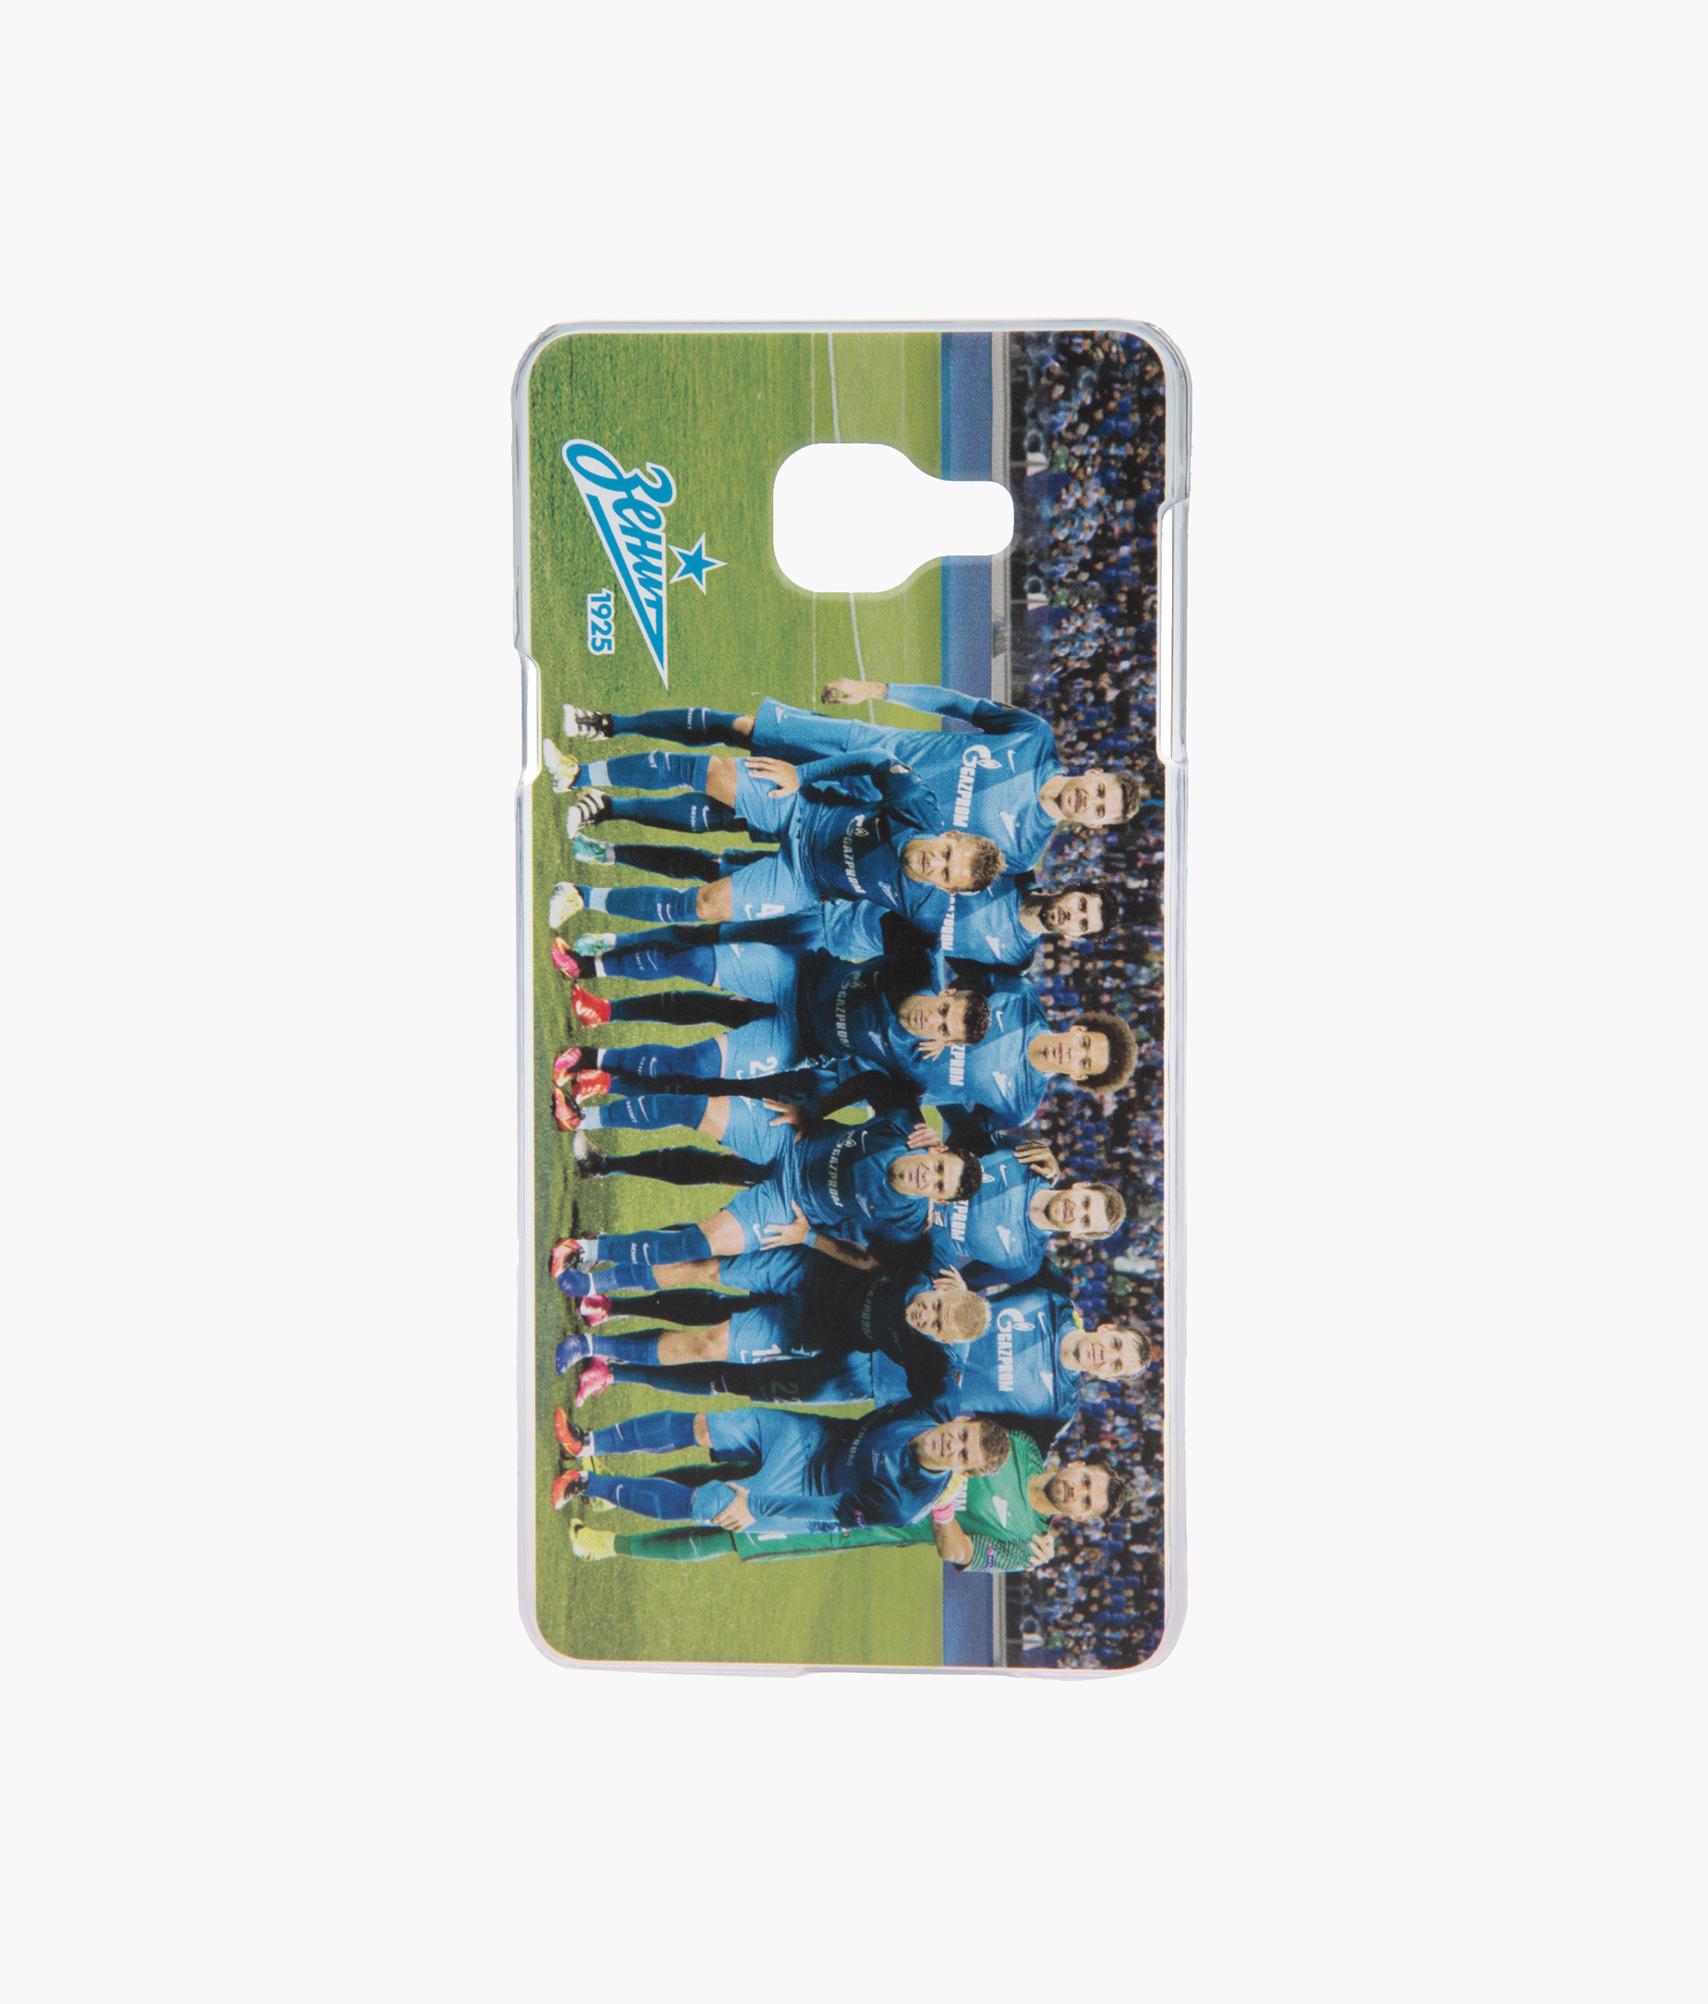 Фото - Чехол Samsung Galaxy A7 Команда 2016/17 Зенит аксессуар чехол neypo для samsung galaxy a10 2019 soft matte silicone dark blue nst11681